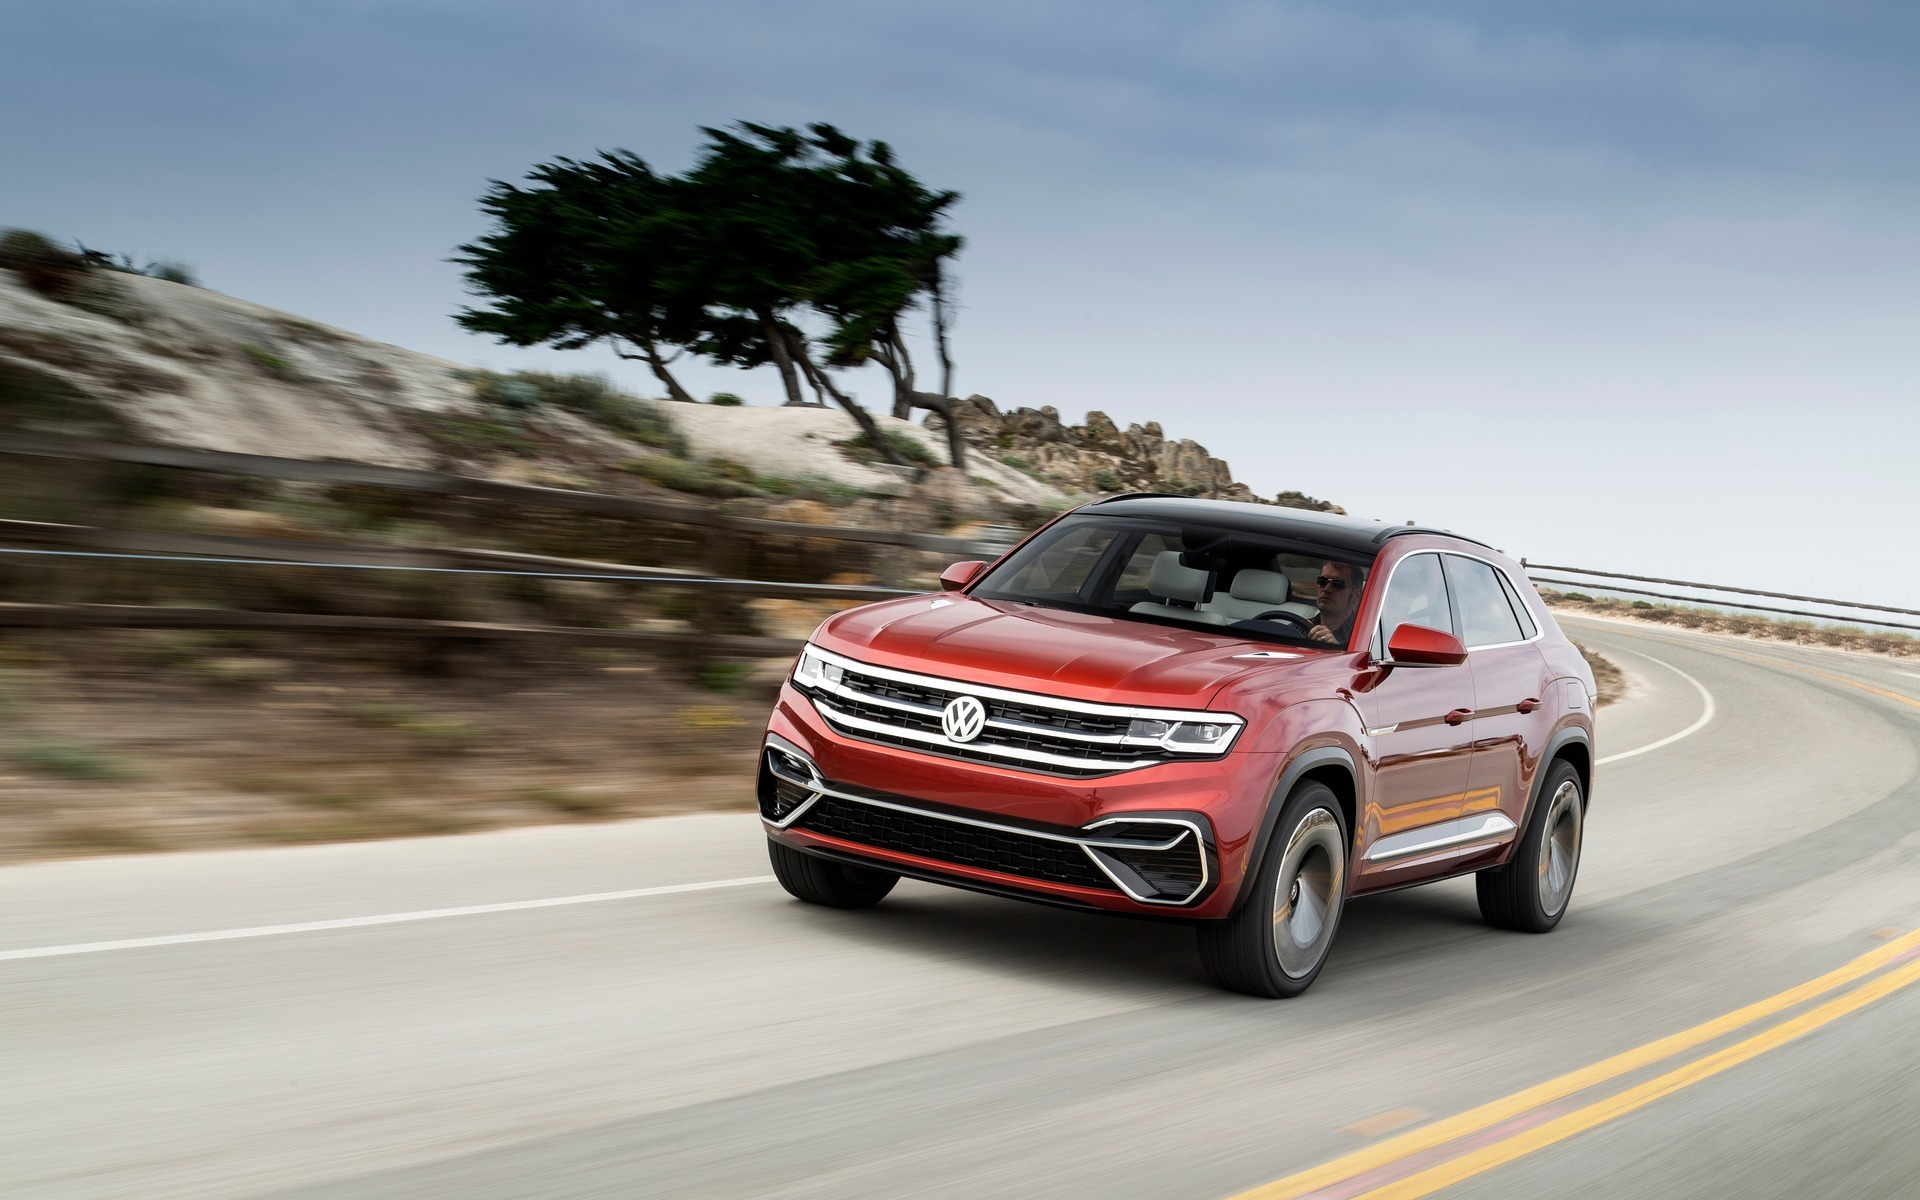 Volkswagen confirme le nom de son prochain VUS : Atlas Cross Sport 358507_Volkswagen_confirme_le_nom_de_son_prochain_VUS